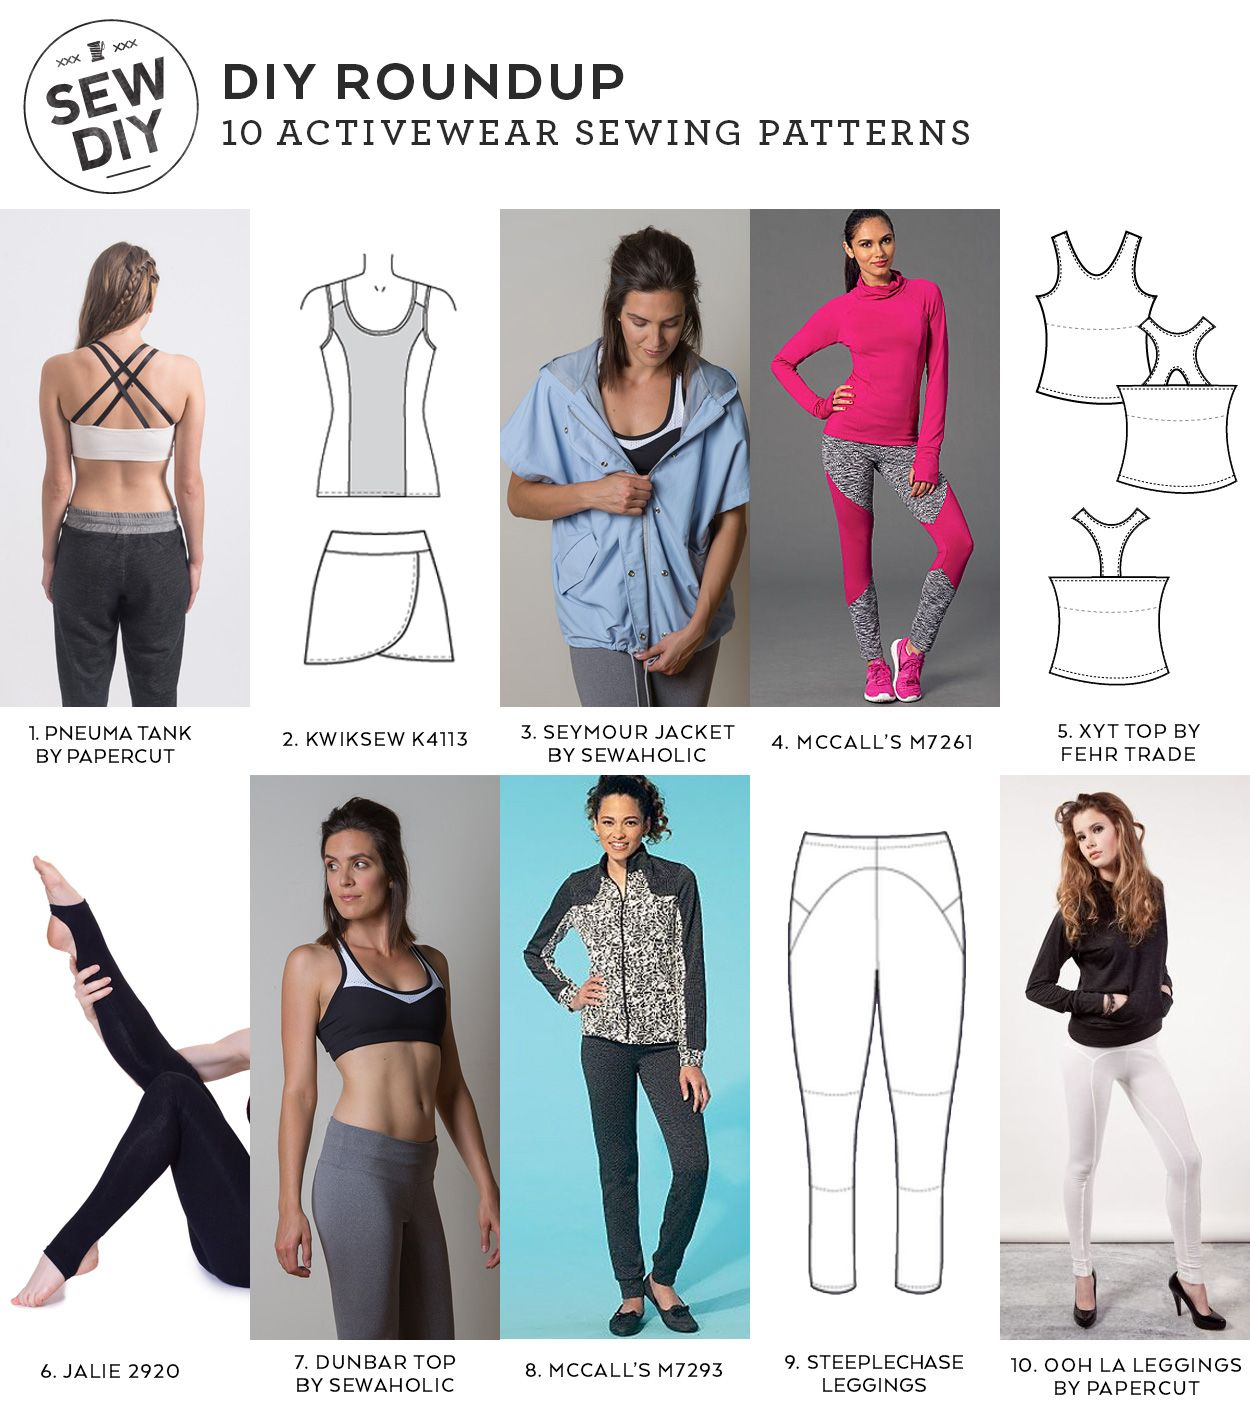 10 activewear sewing patterns diy roundup sewing diy clothing 10 activewear sewing patterns jeuxipadfo Choice Image